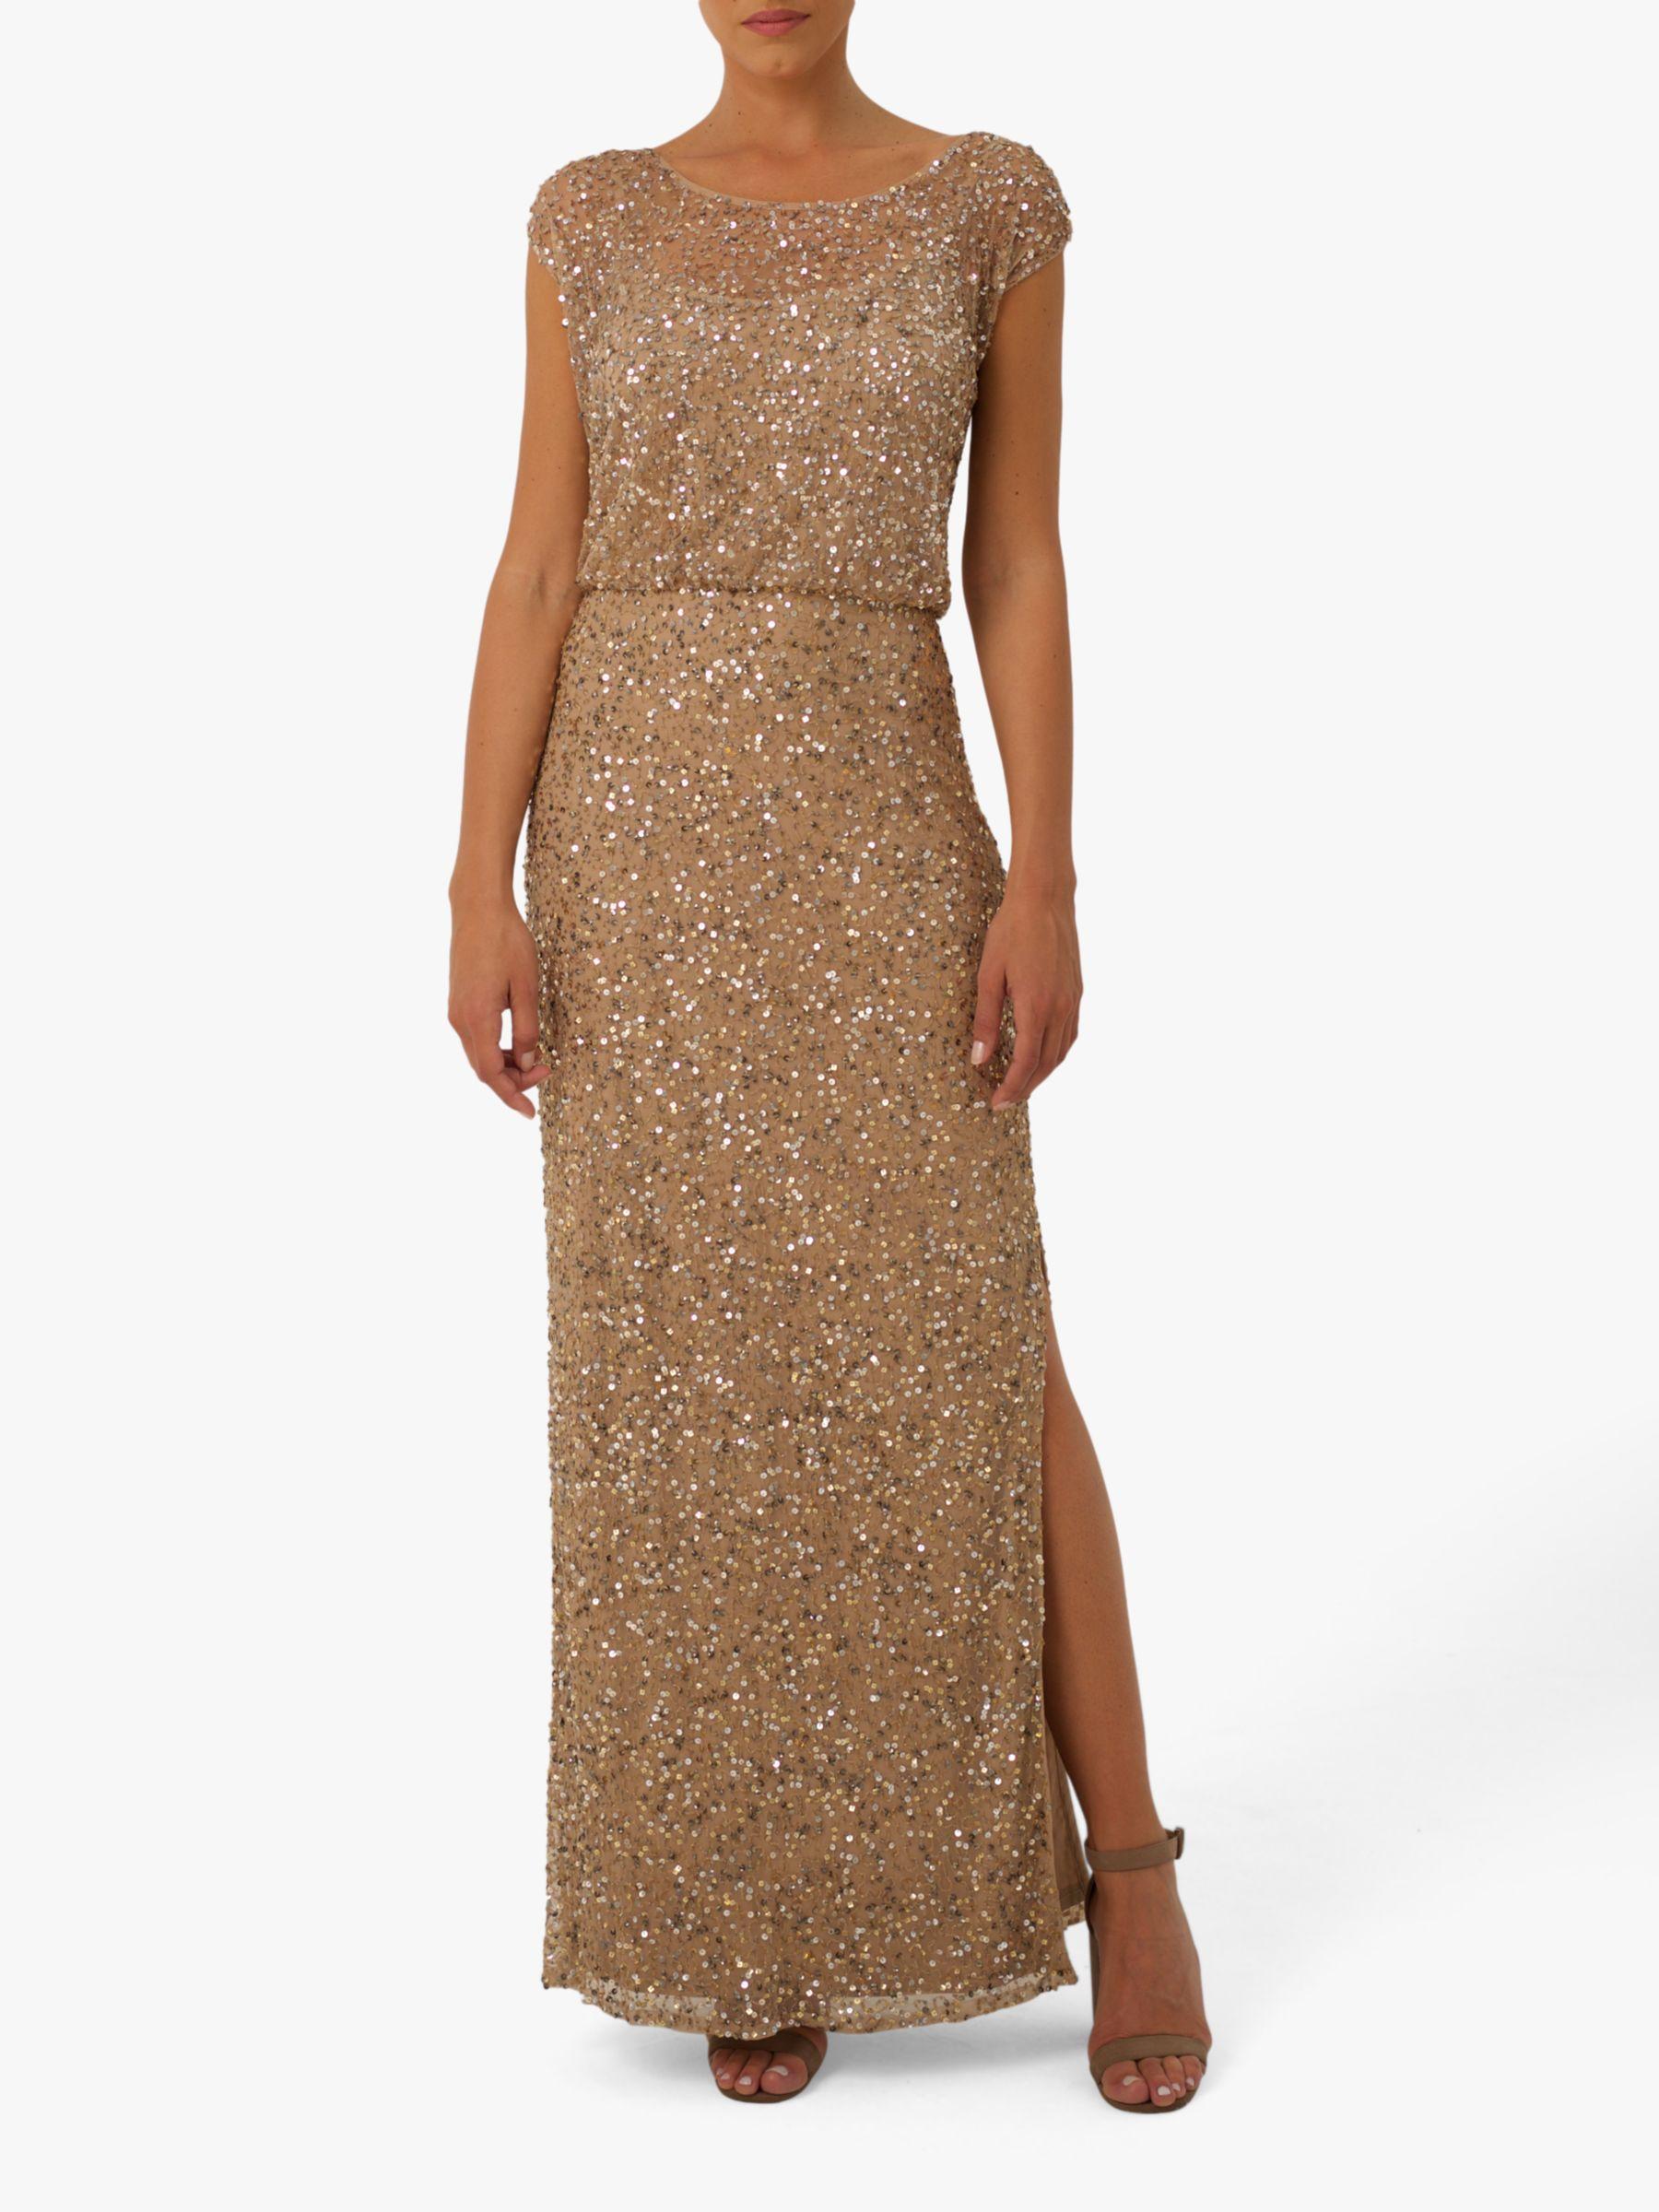 RAISHMA Raishma Marilyn Embellished Gown, Gold